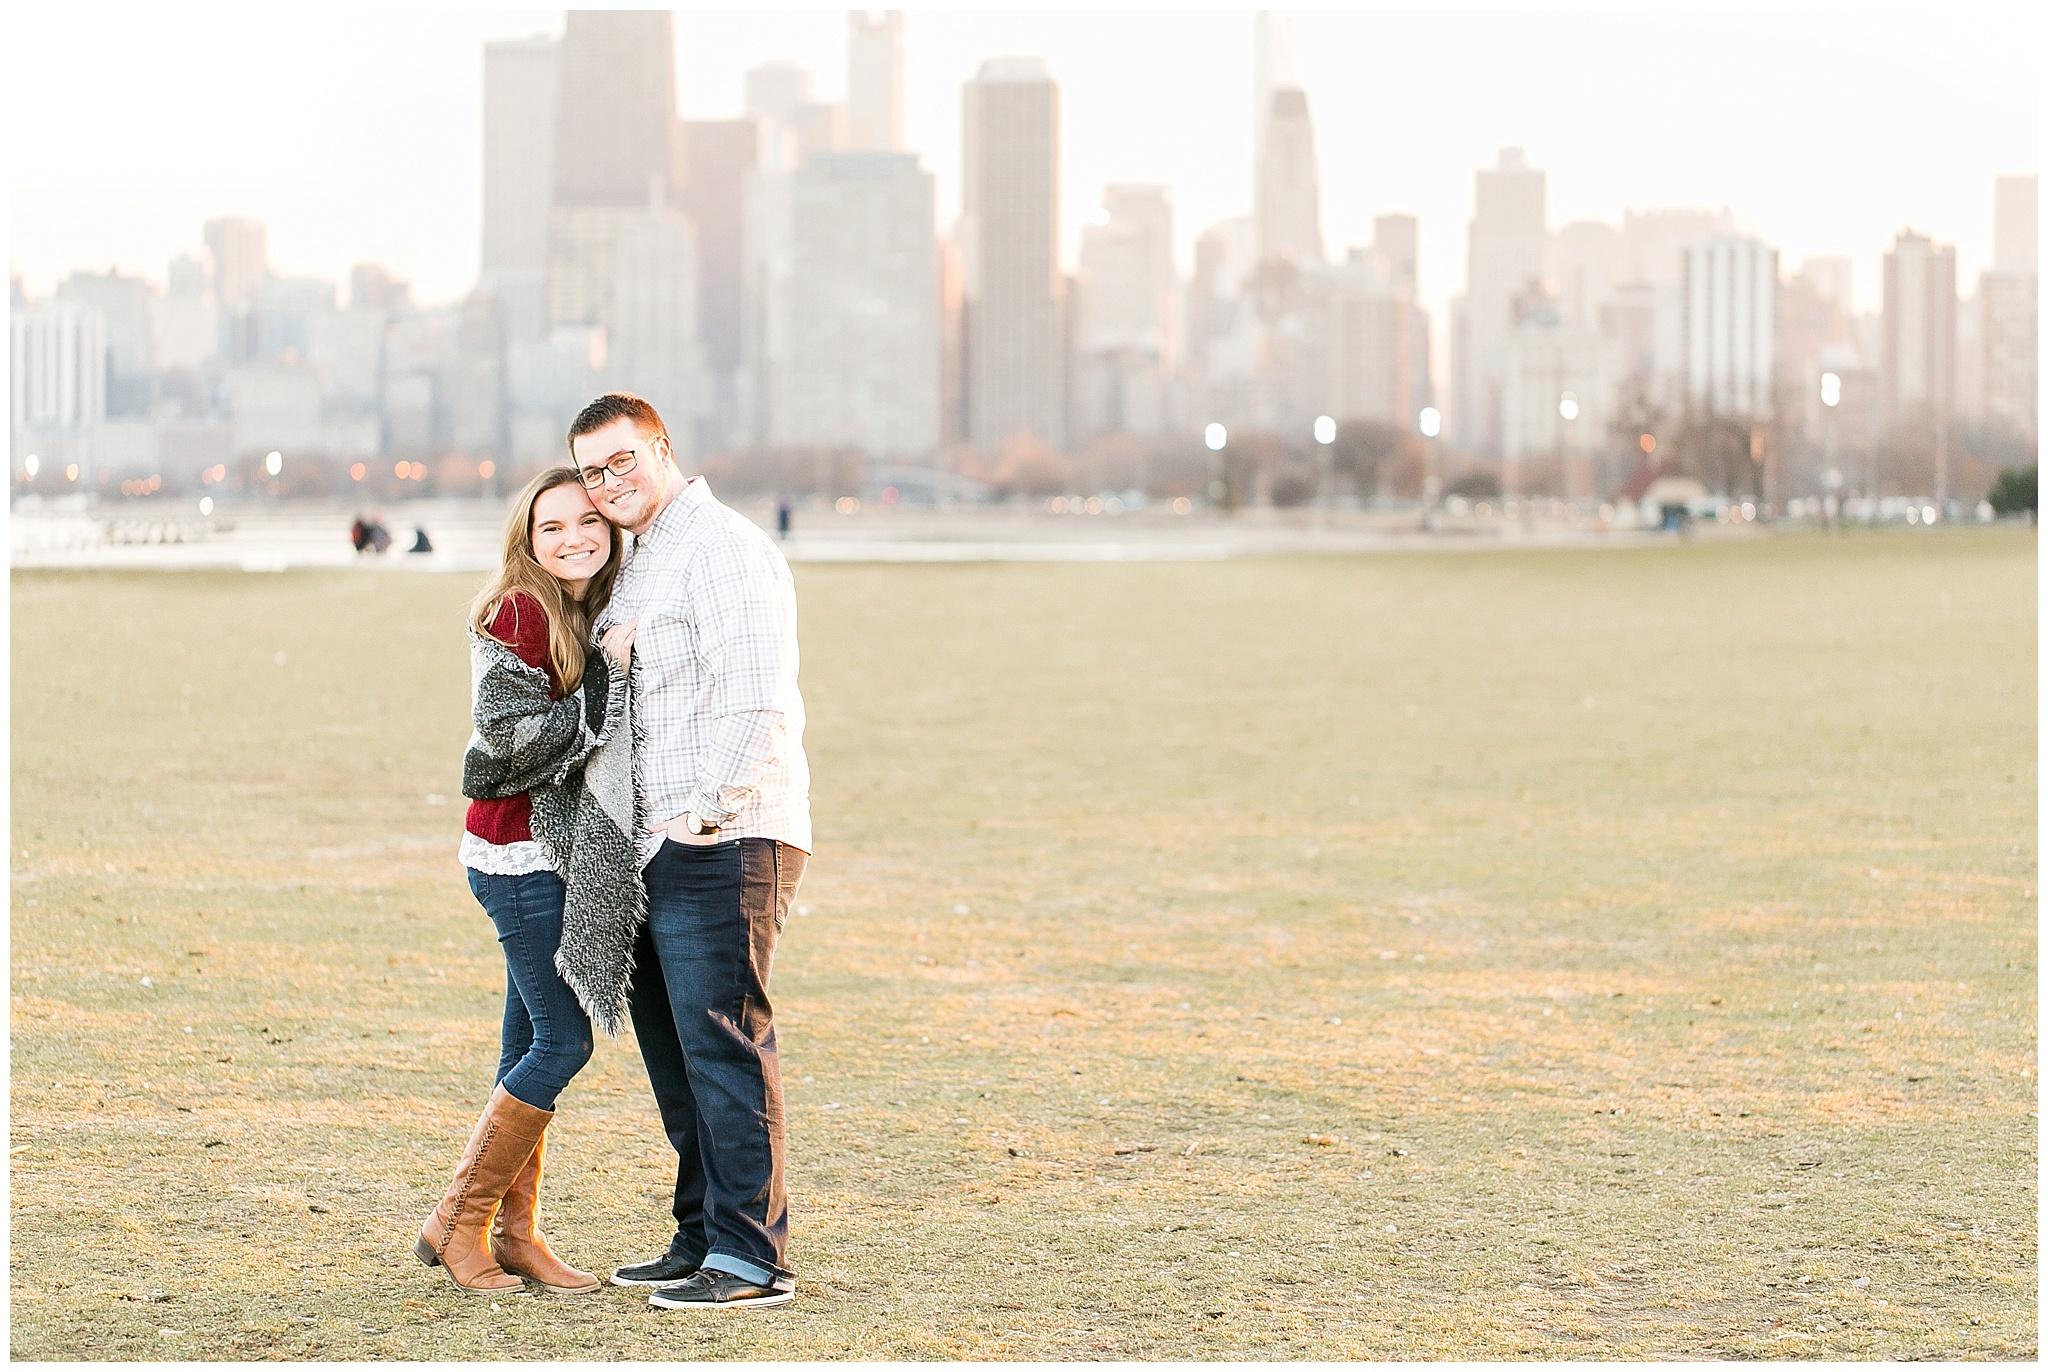 Chicago_Engagement_and_wedding_photographer_chicago_skyline_1002.jpg